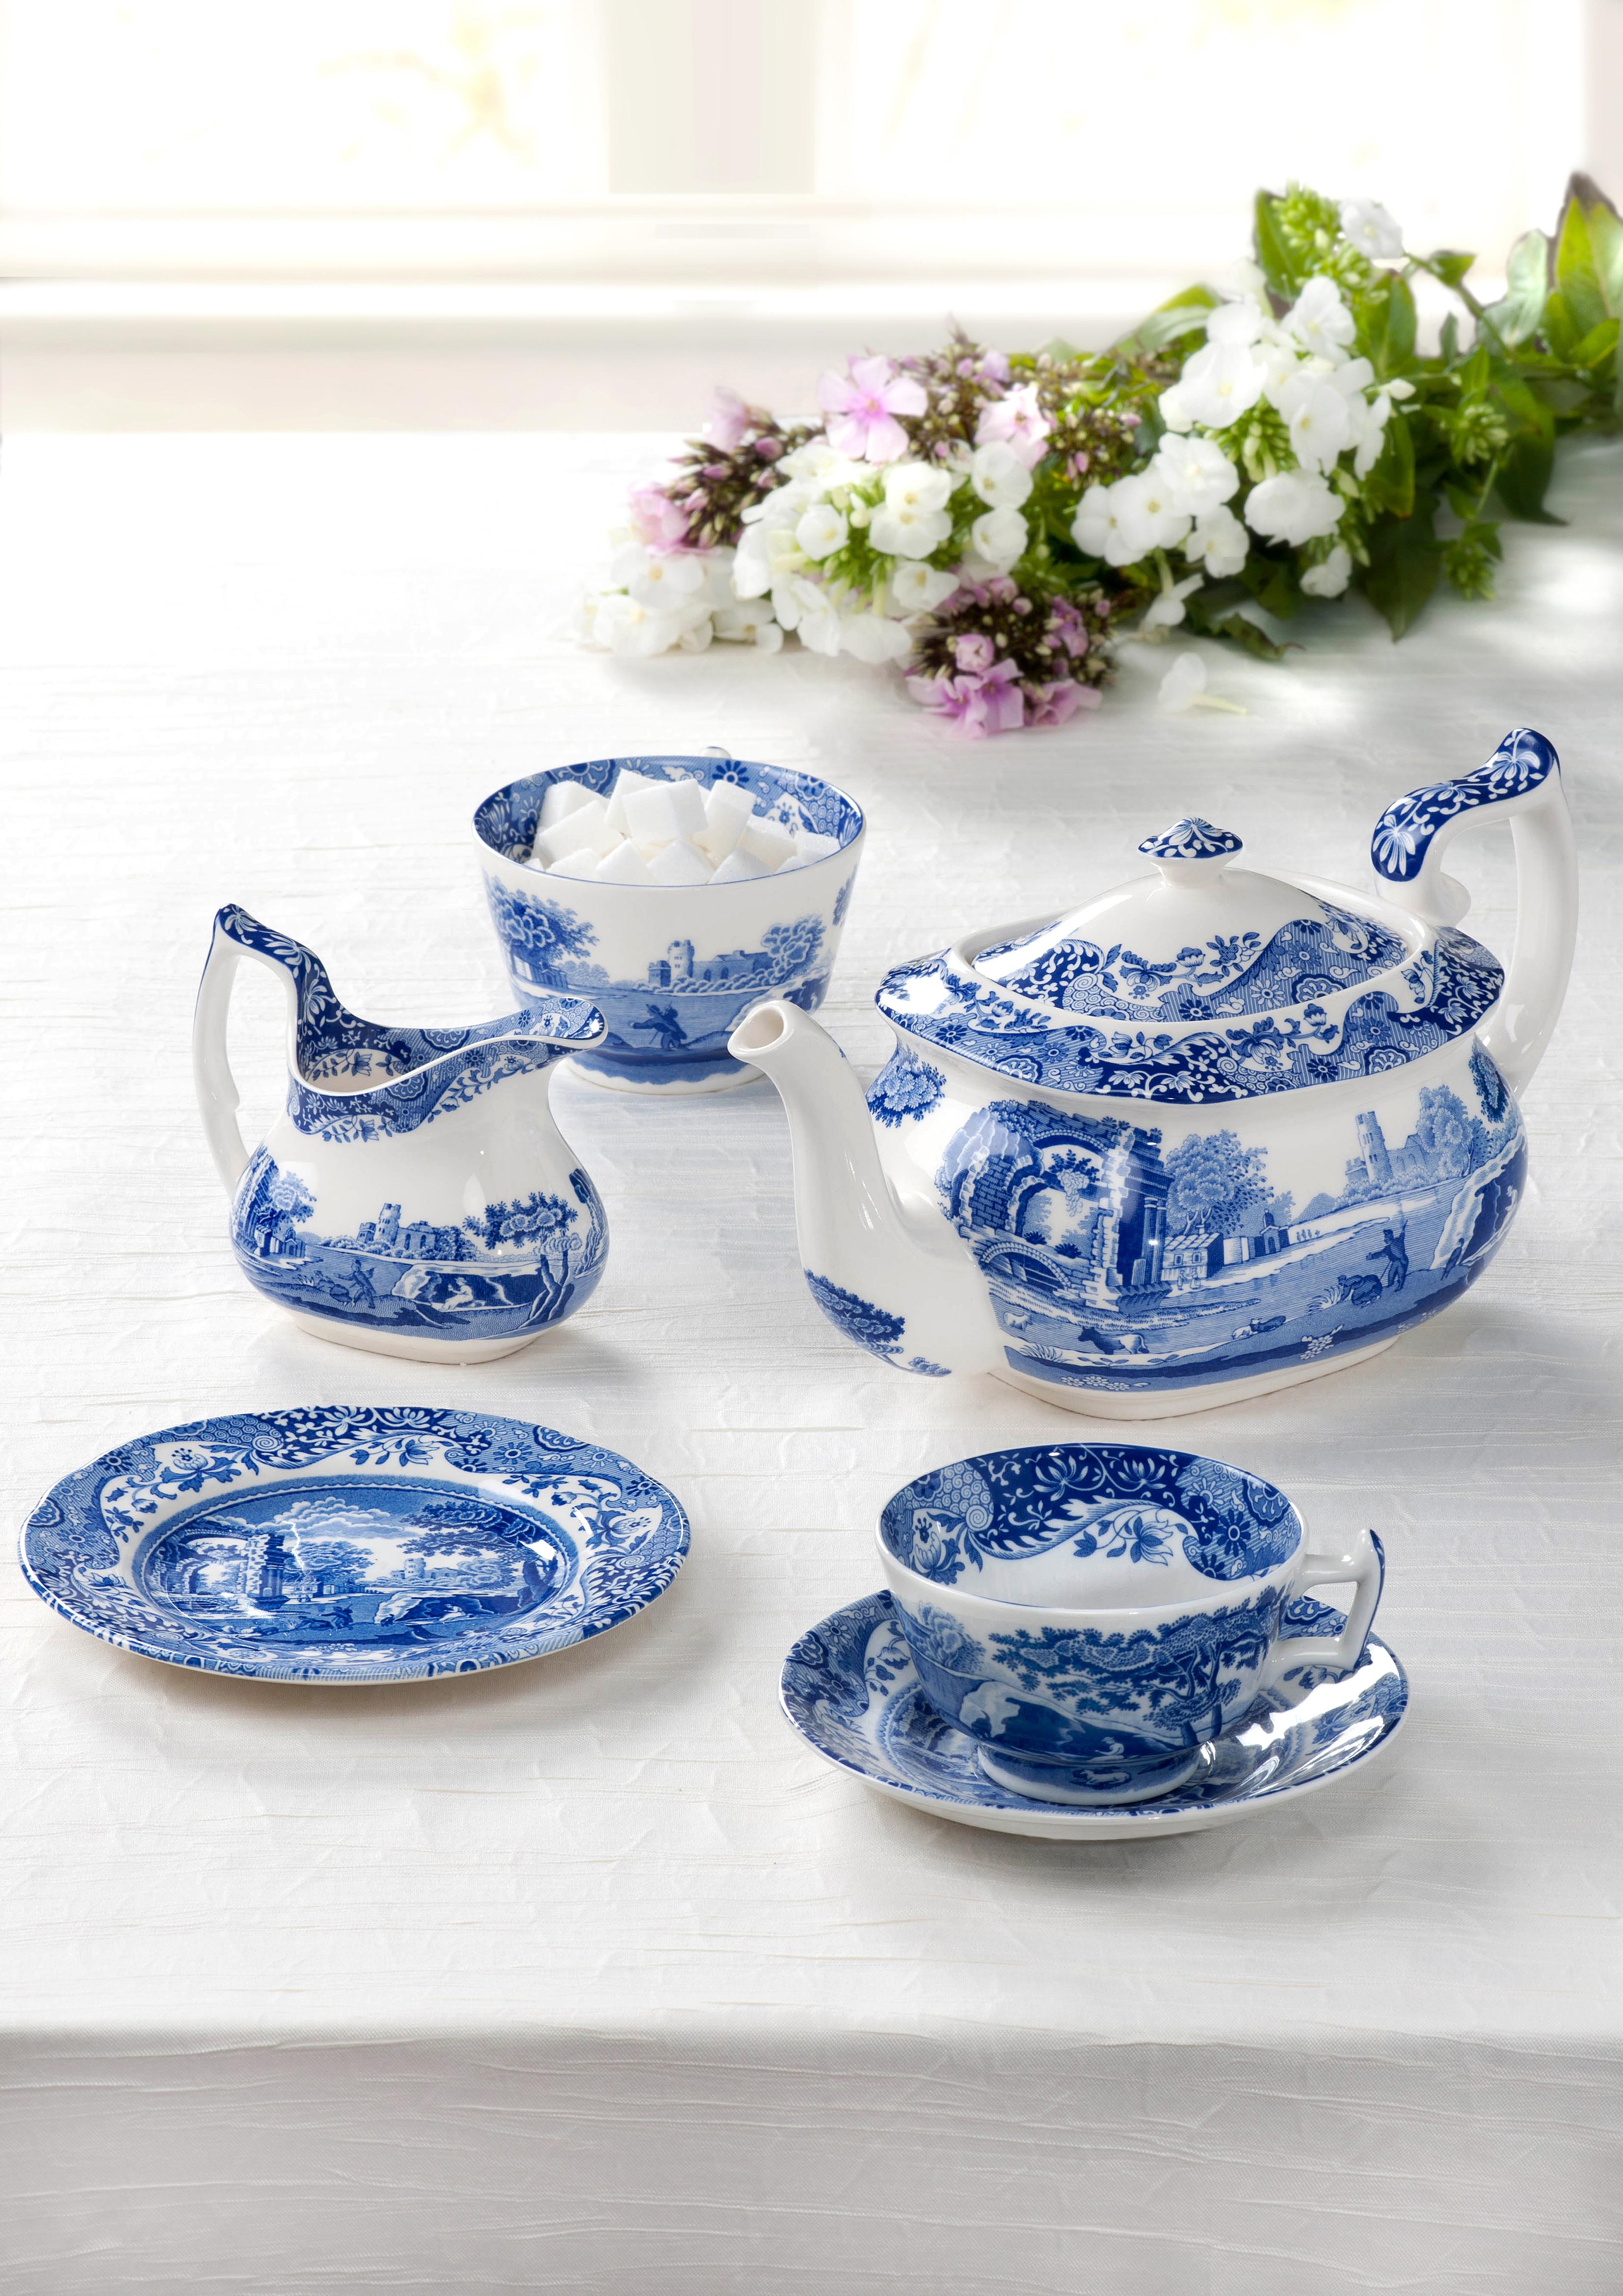 Niessner Geschirr - ADV - Blue Italian Tea Set